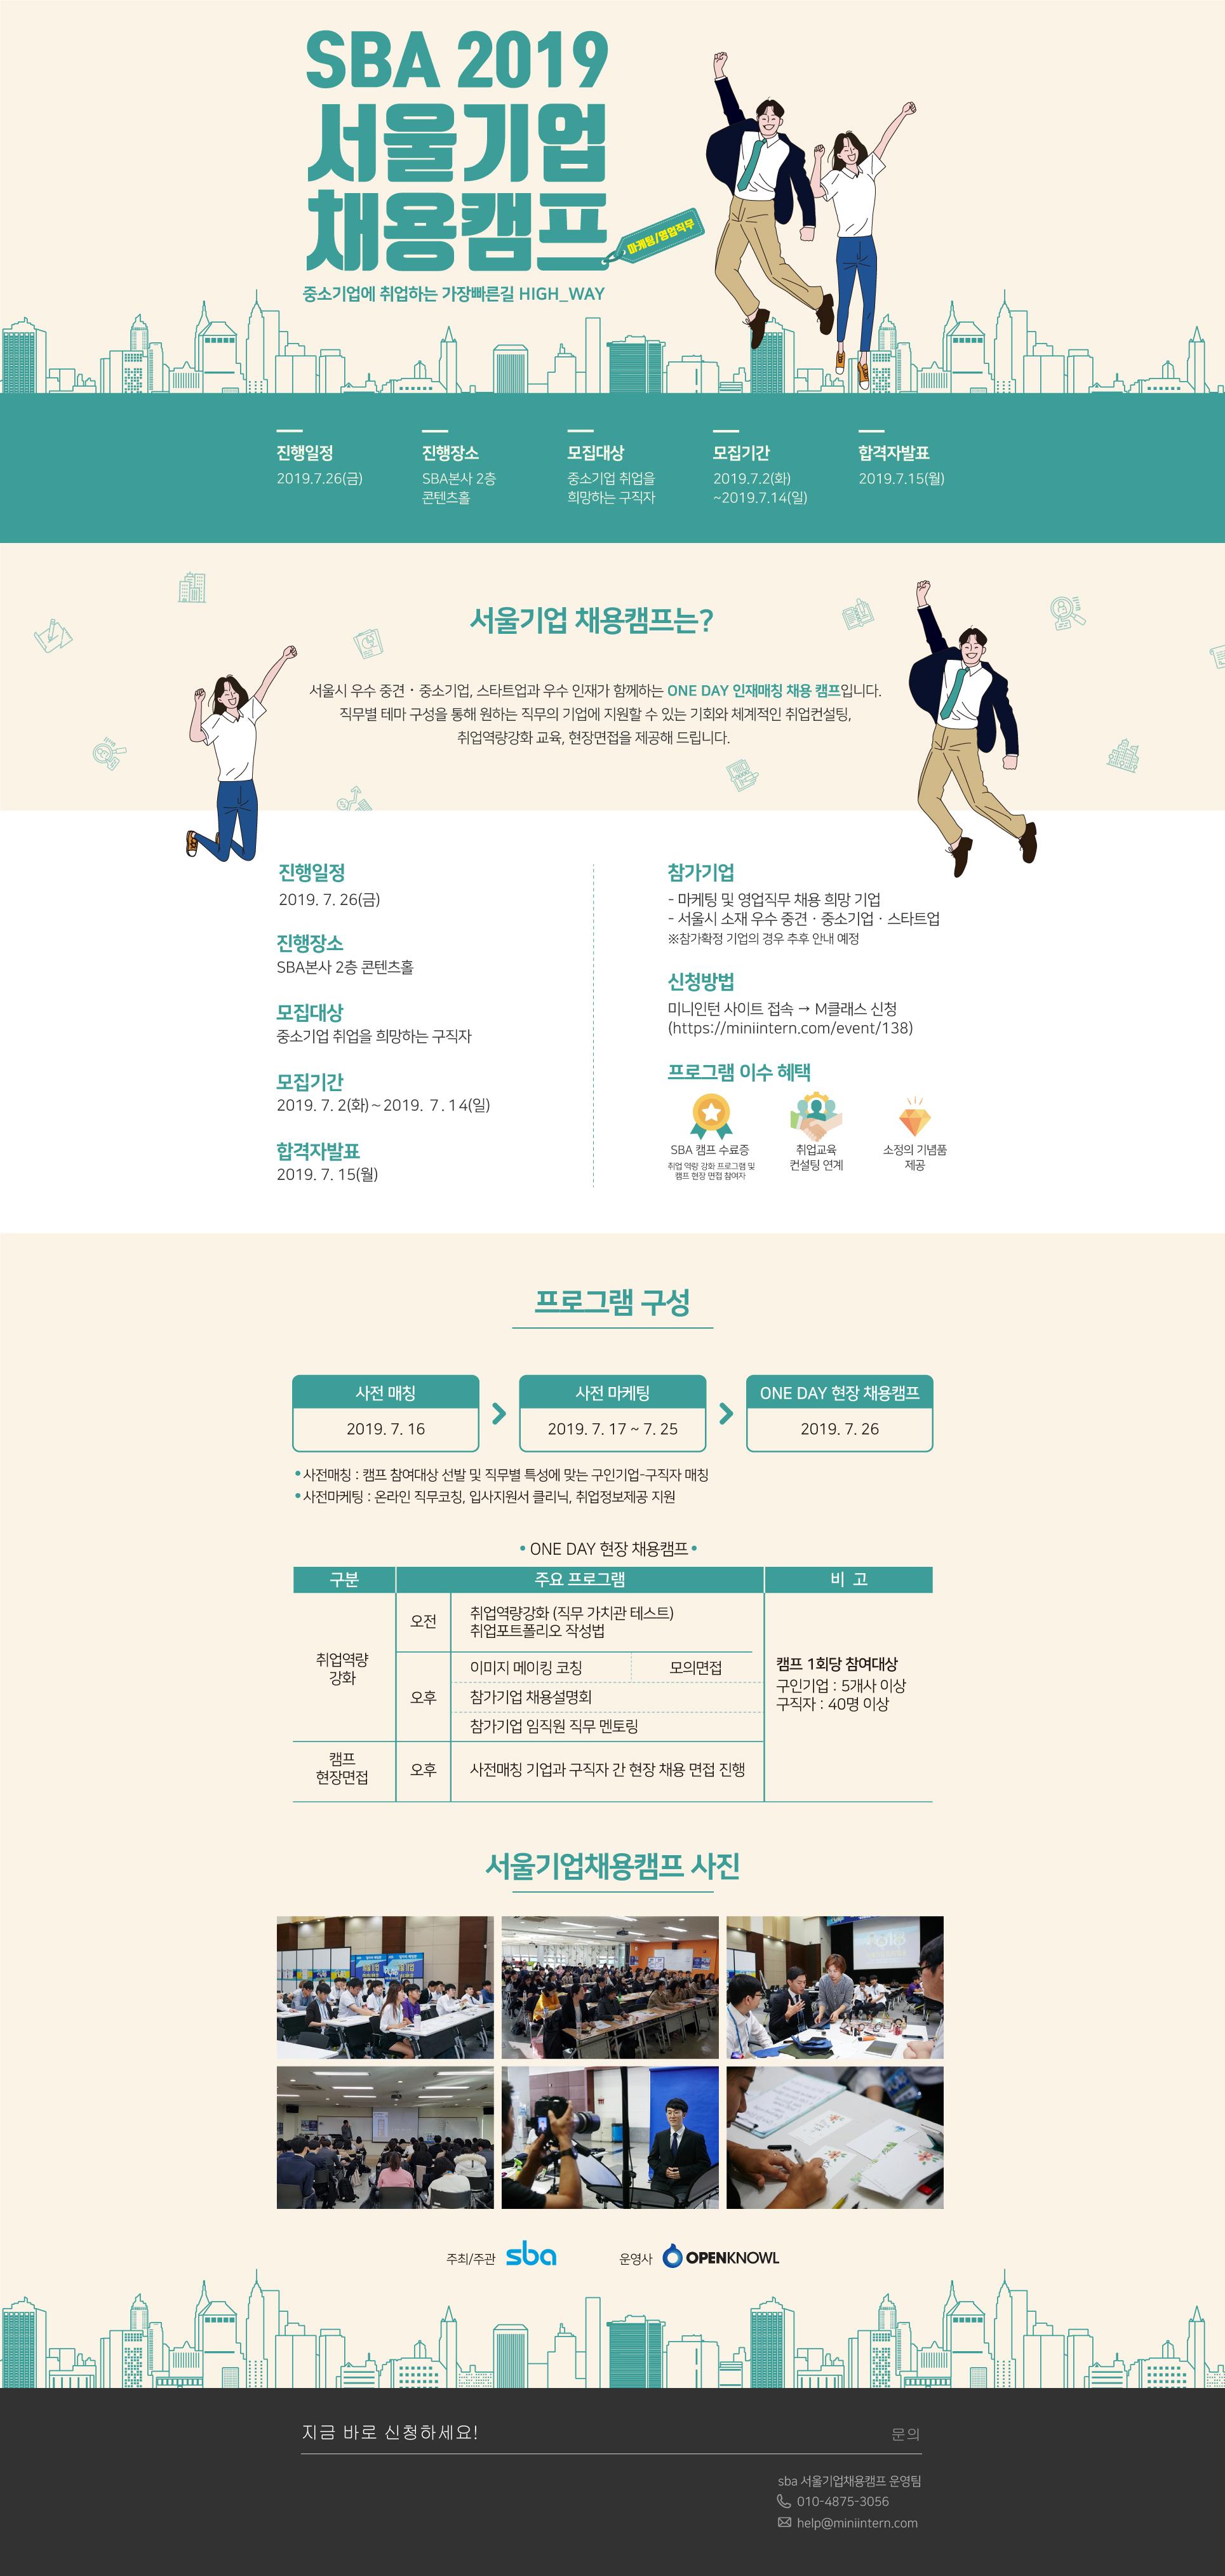 SBA 2019 서울기업채용캠프 참가자 모집